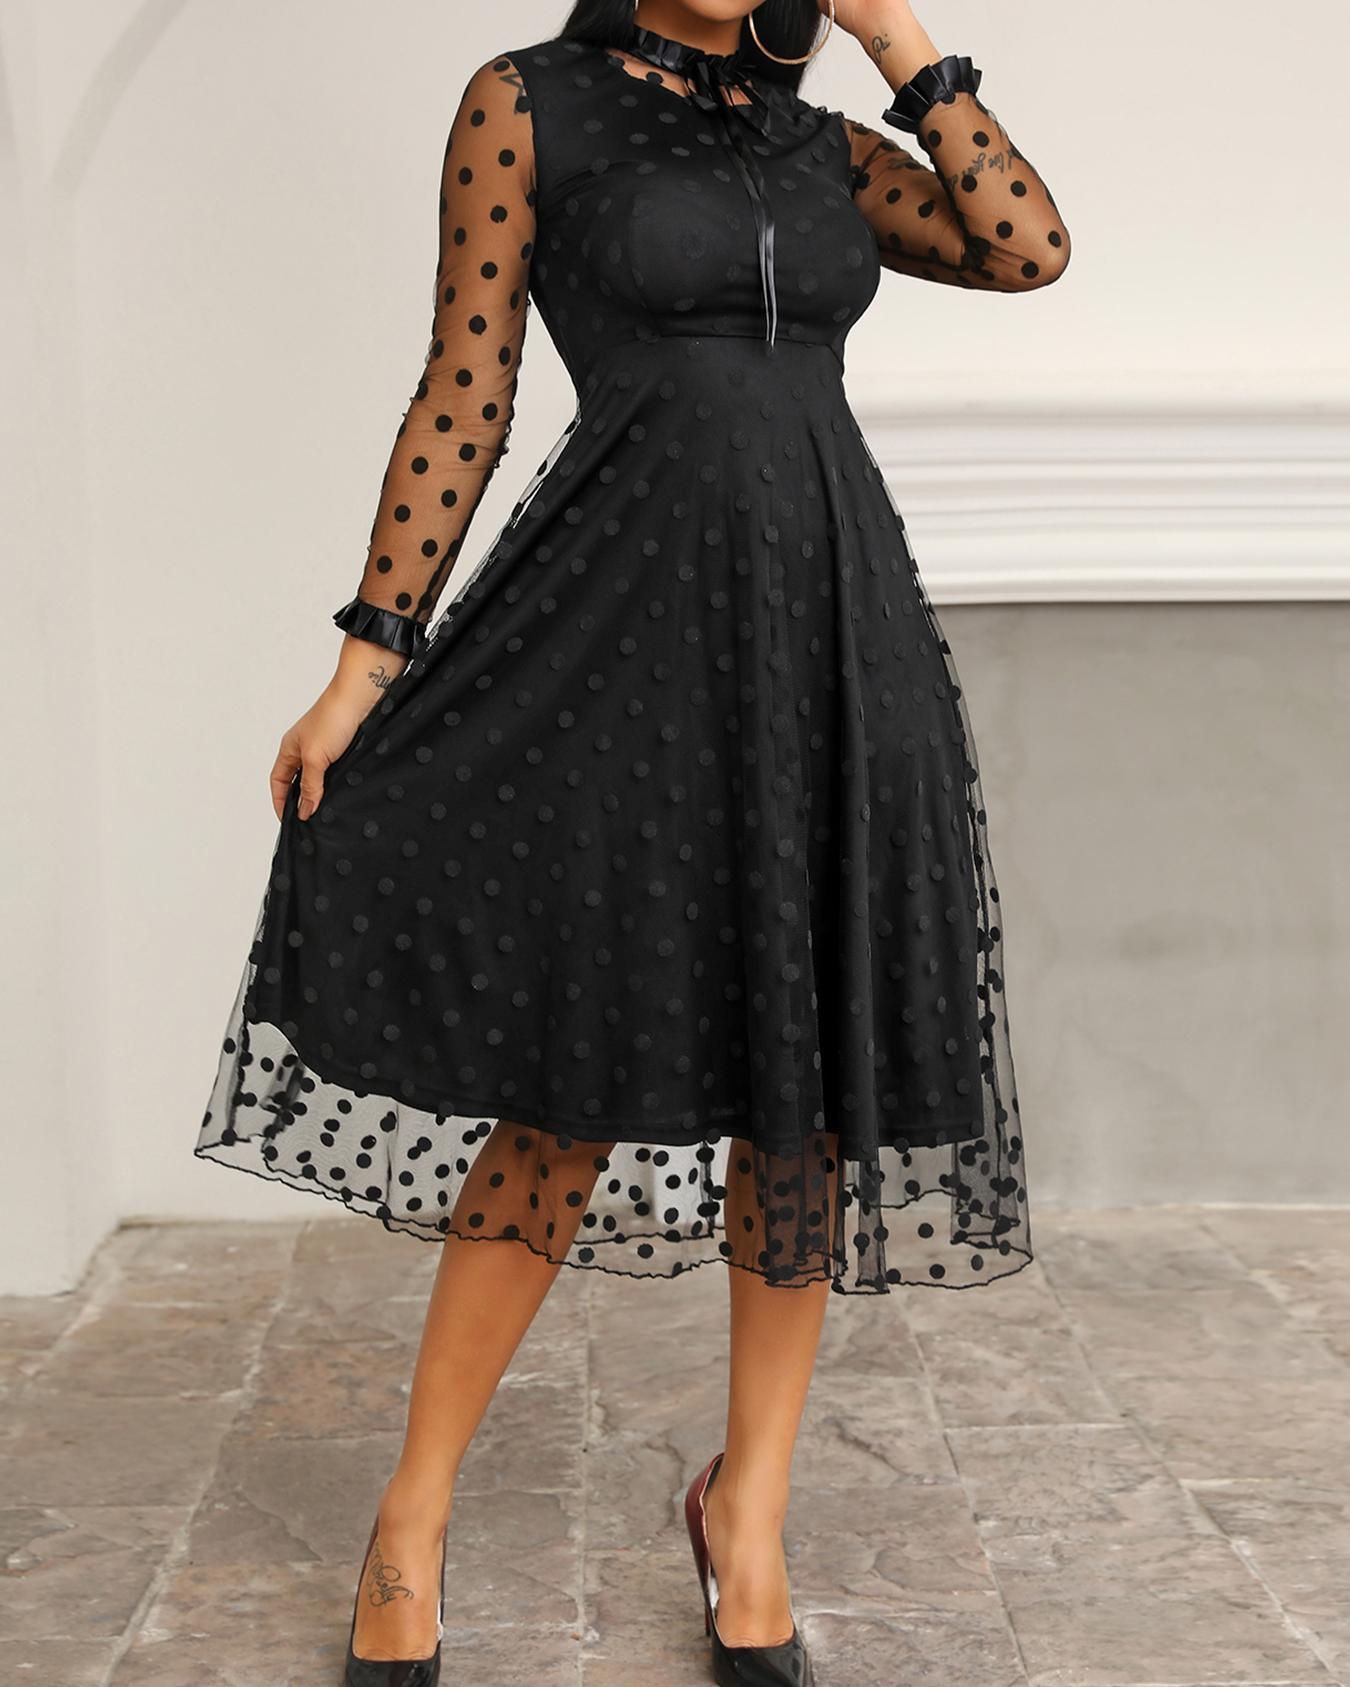 chicme / Polka Dot Sheer Mesh Long Sleeve Dress